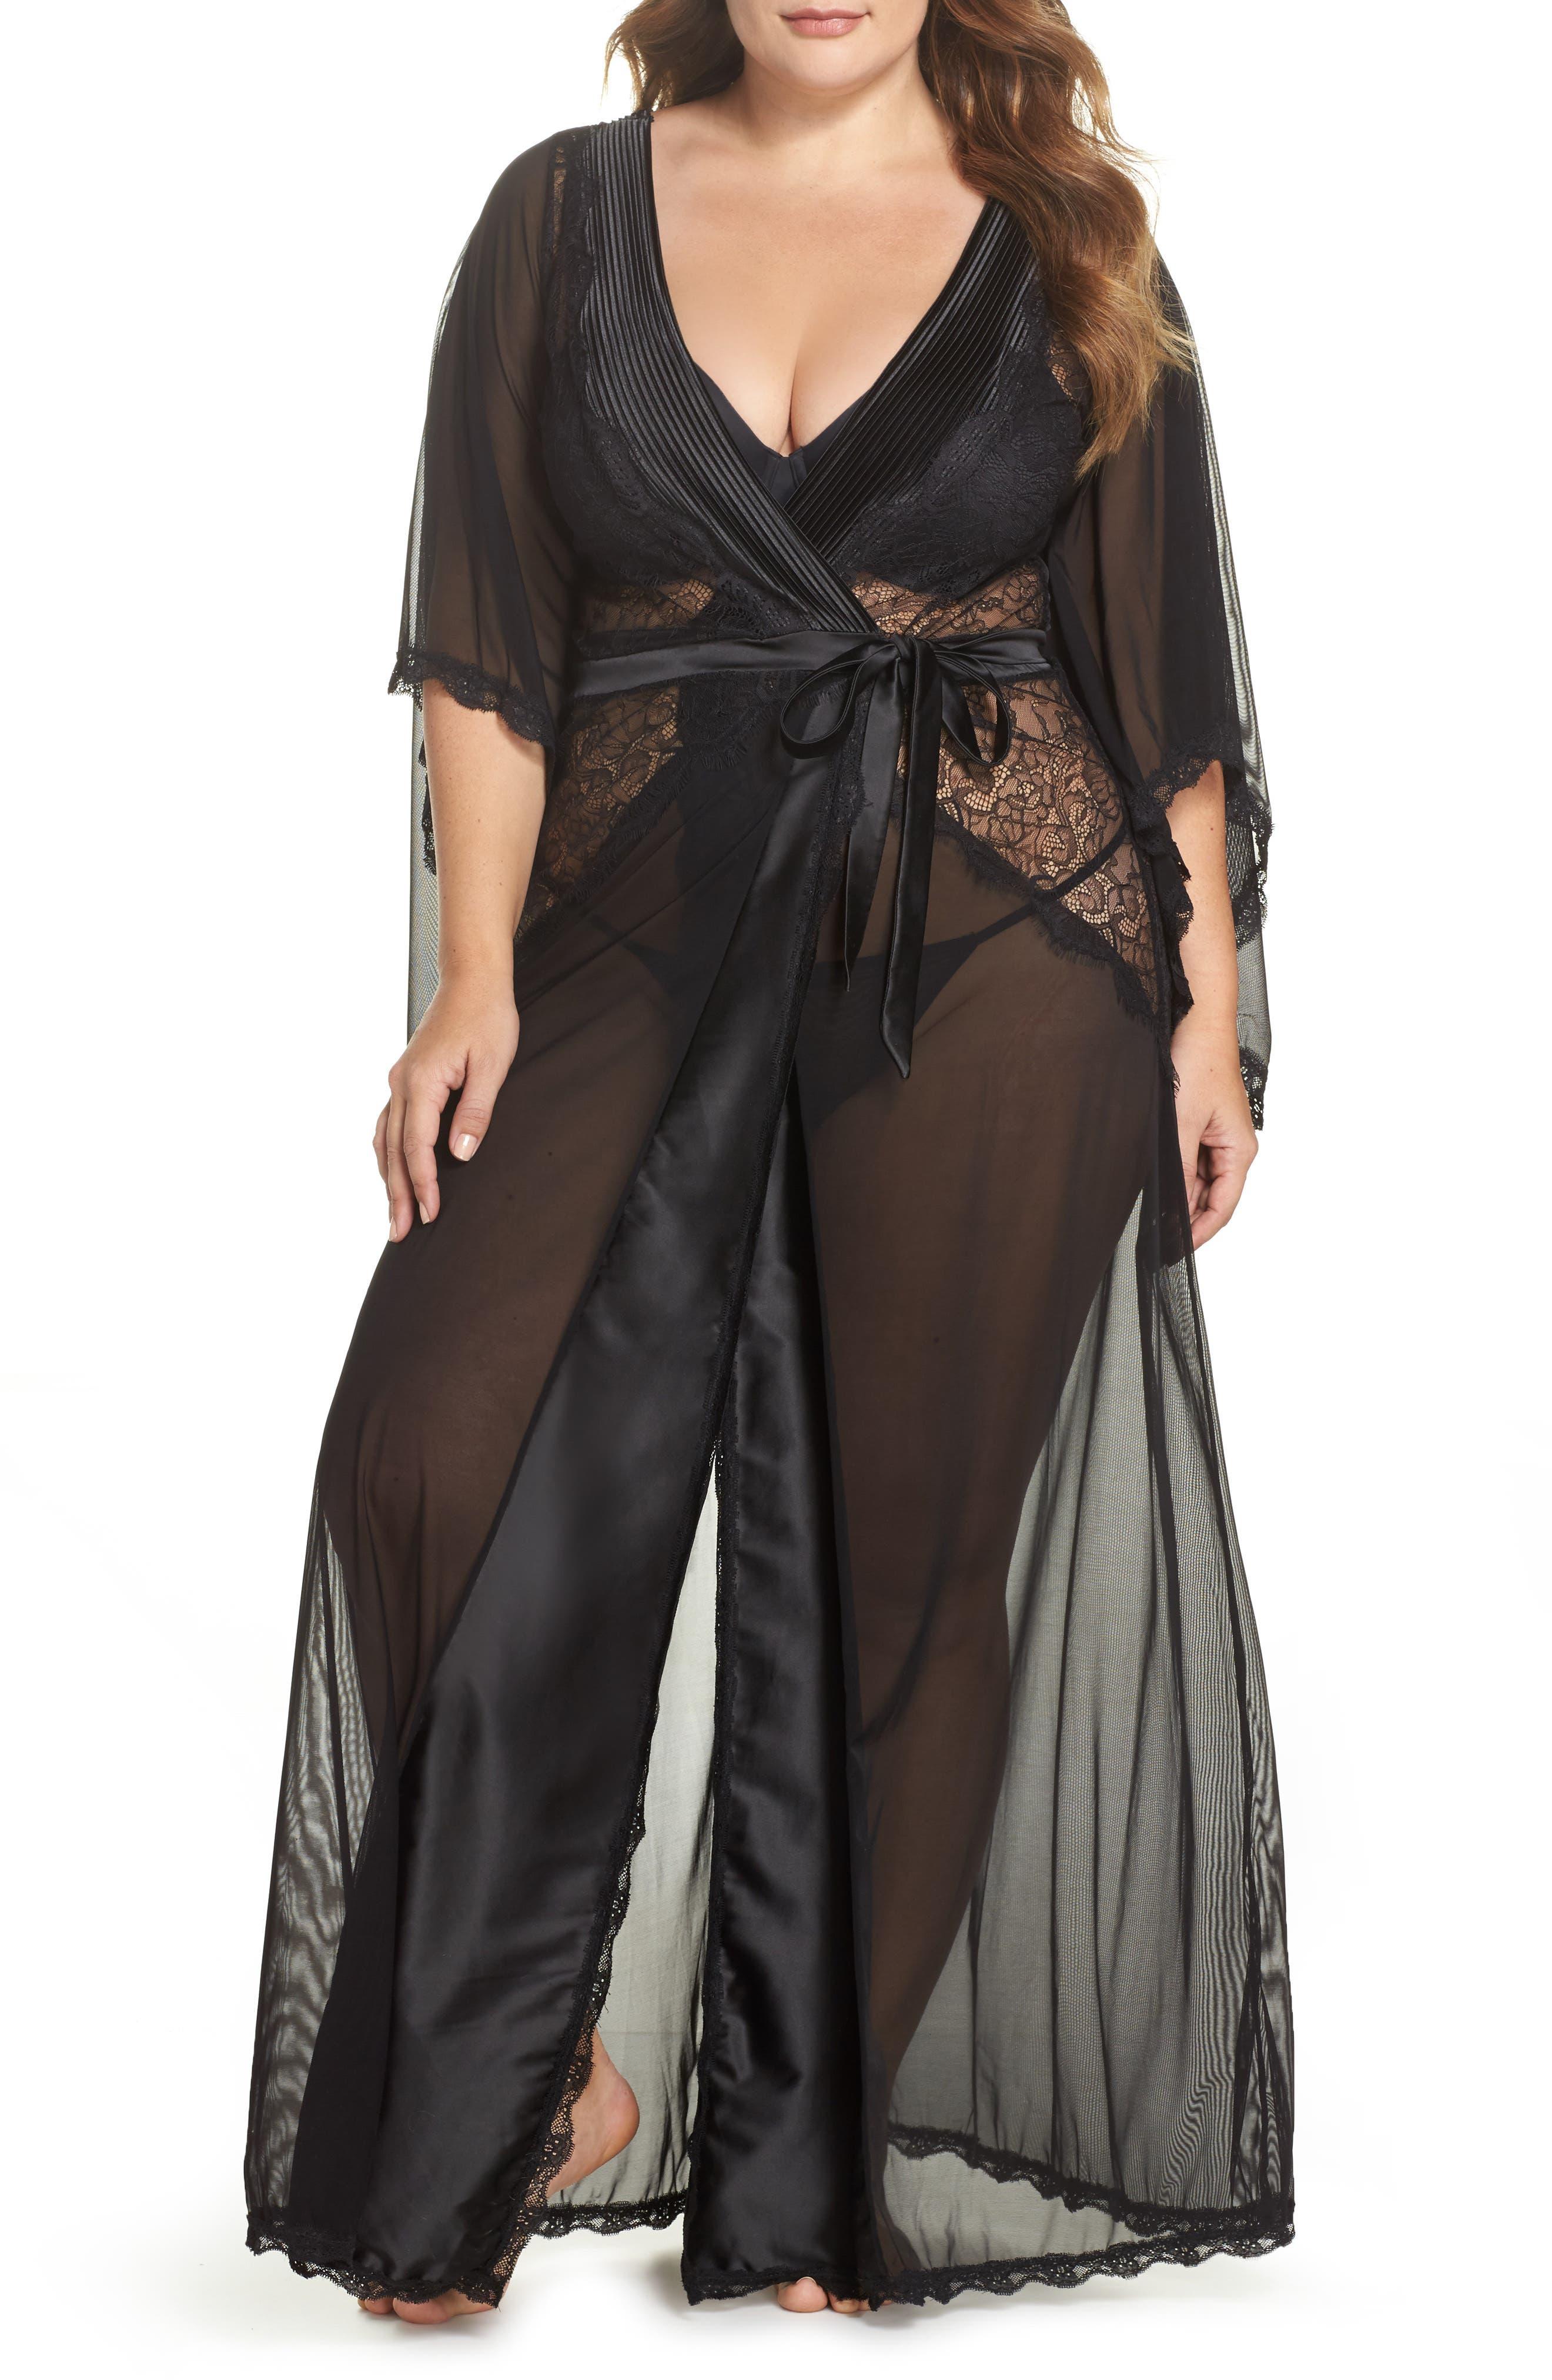 Oh La La Cheri Nicolette Sheer Robe & G-String (Plus Size)